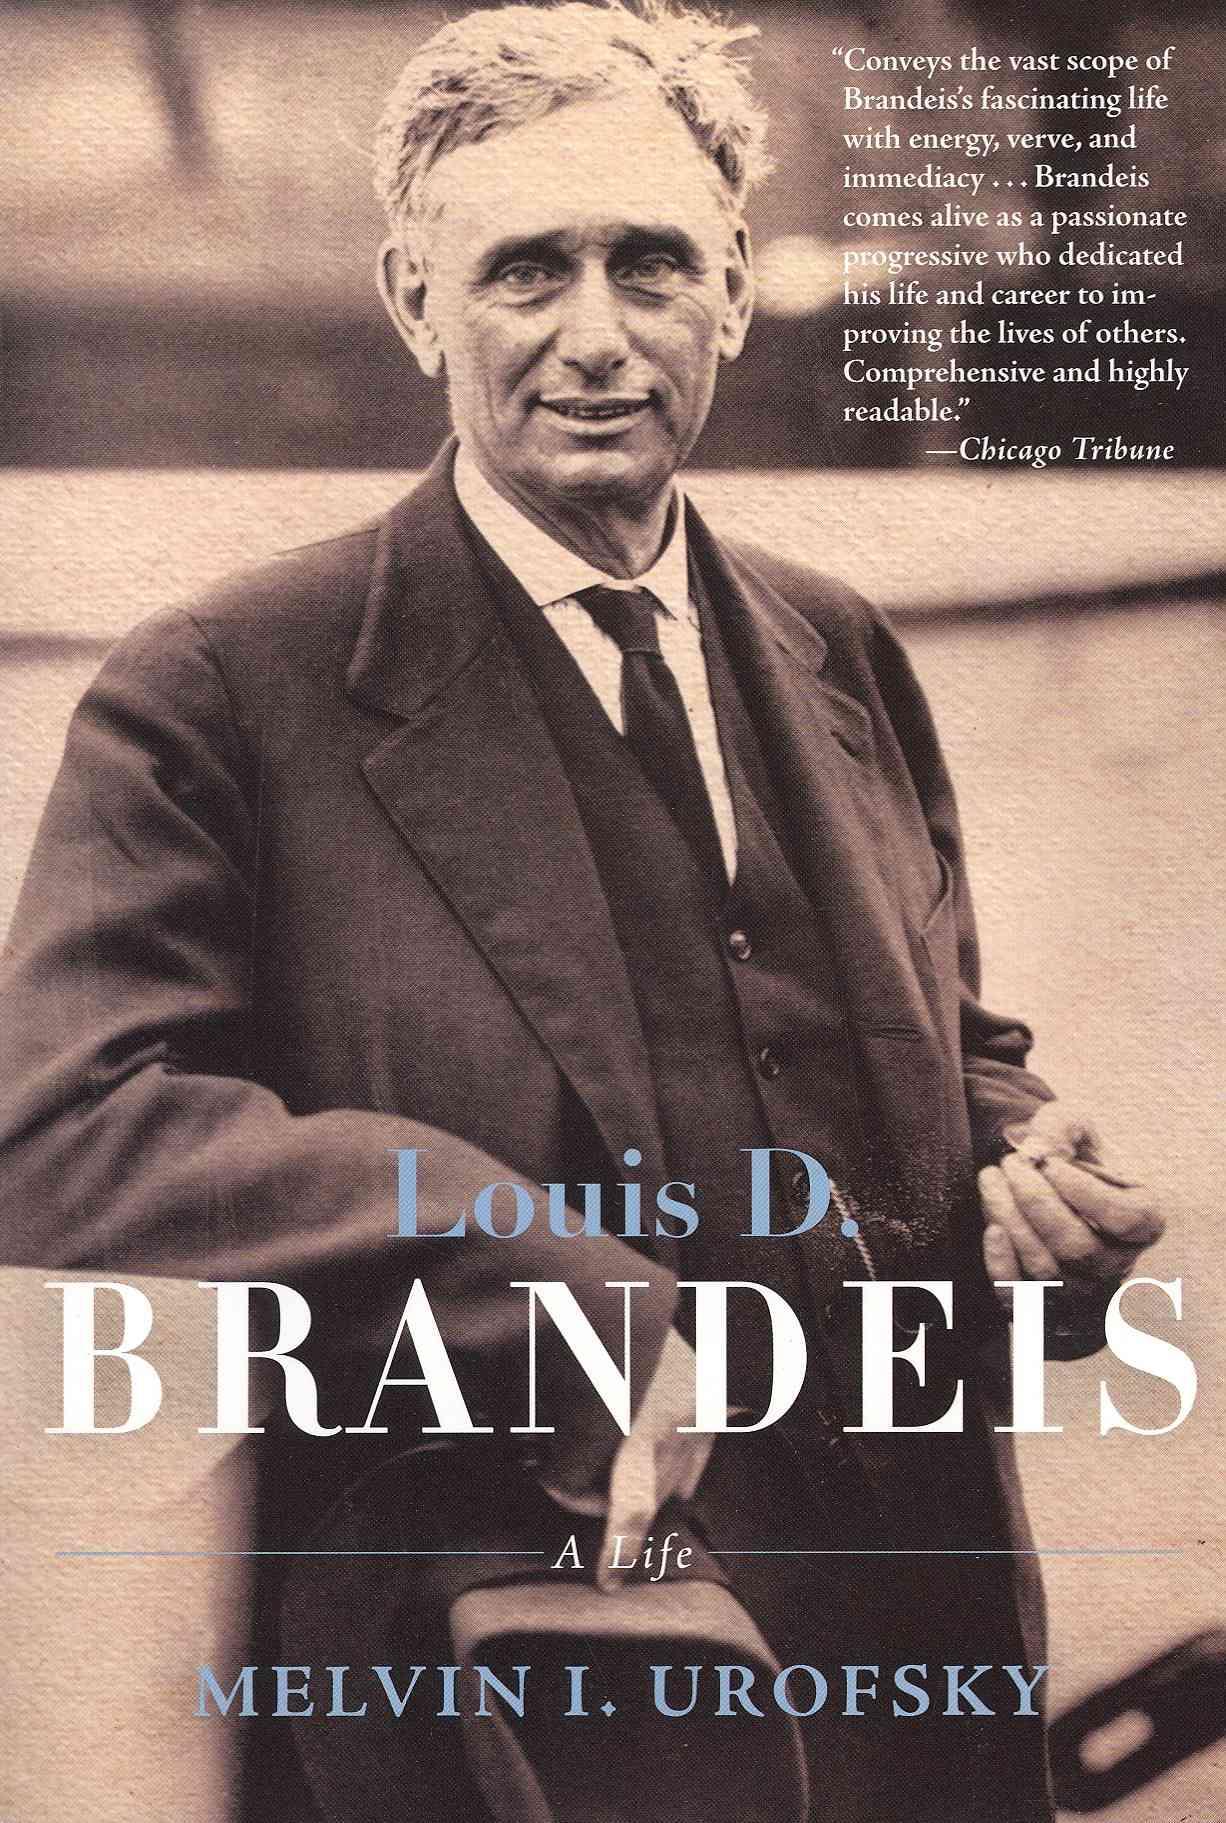 Louis D. Brandeis By Urofsky, Melvin